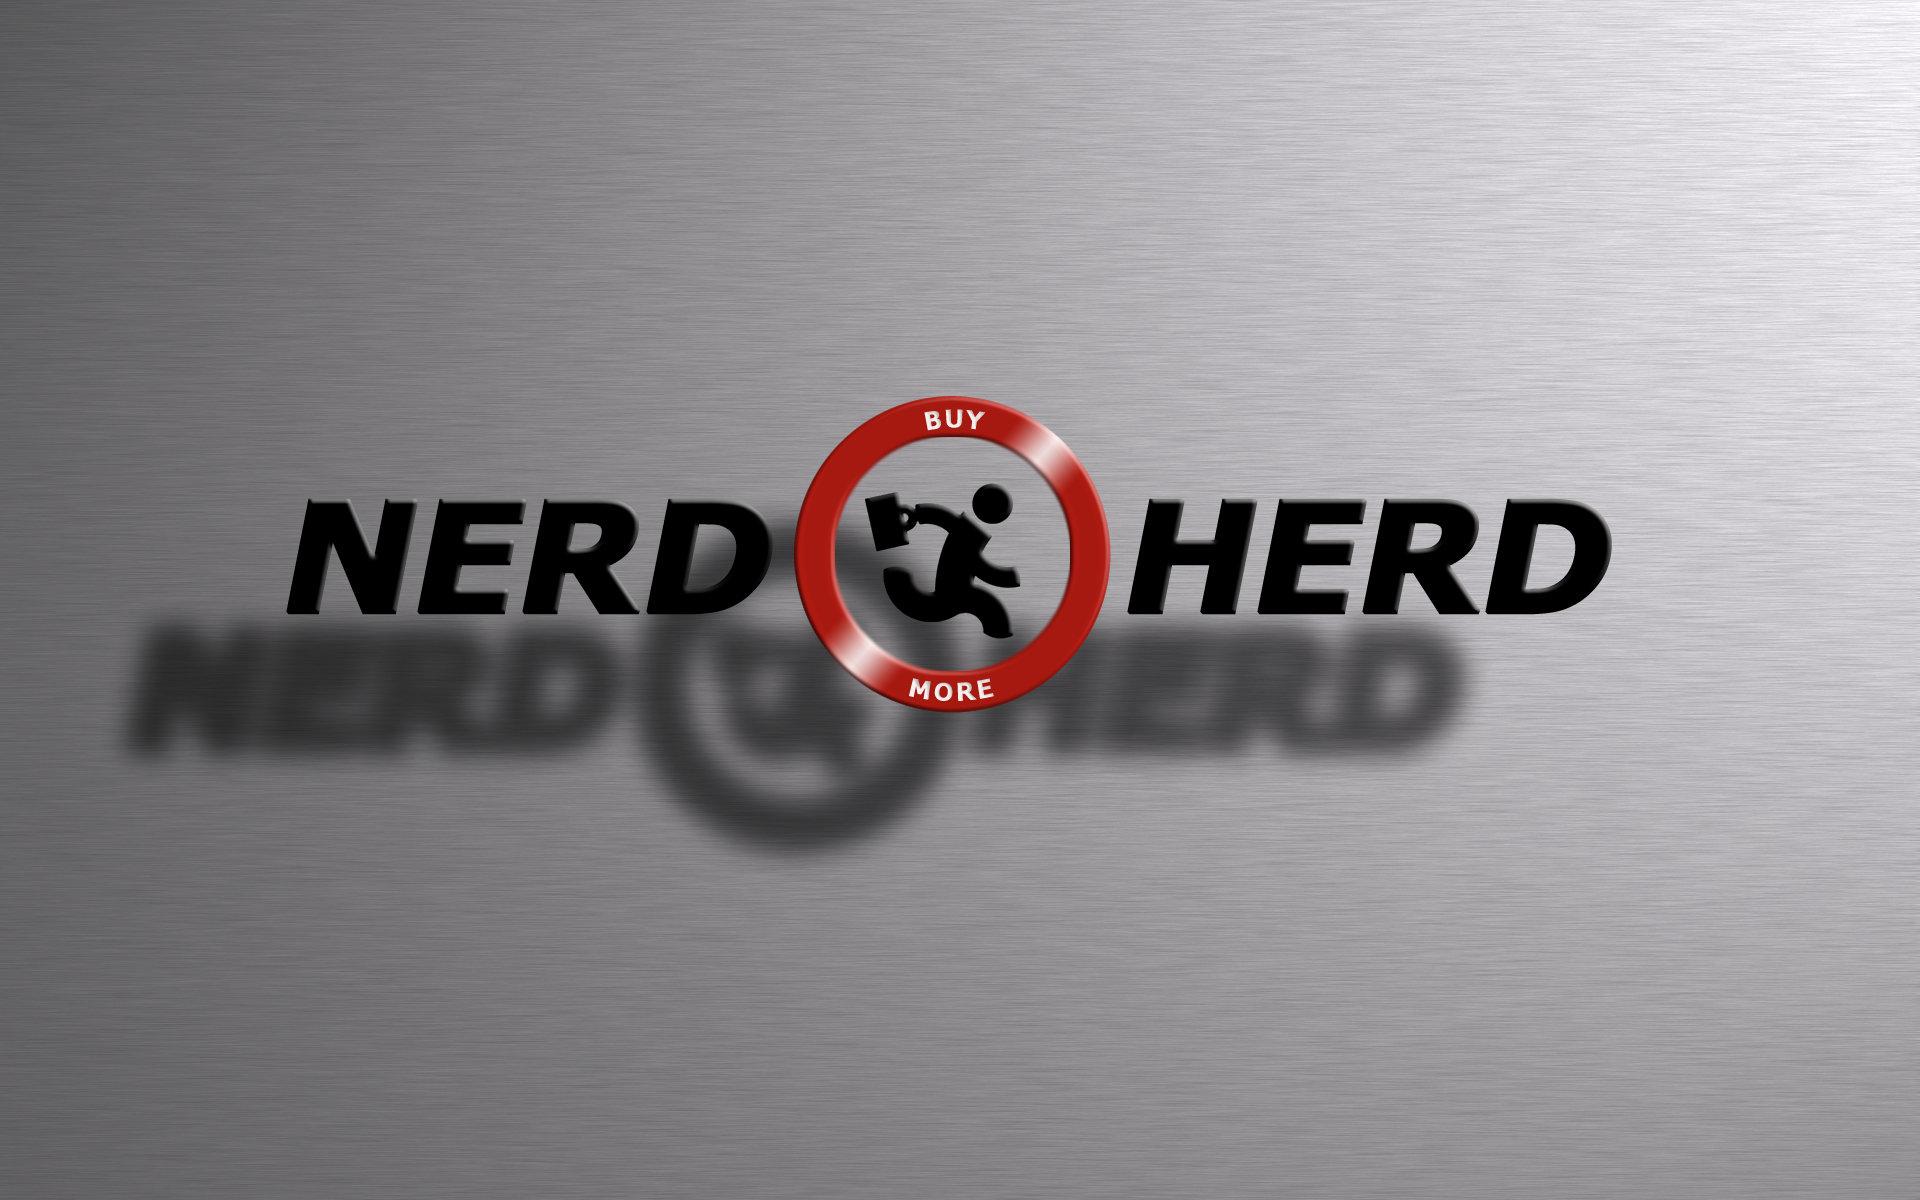 Chuck Nerd Herd Wallpaper by MythosNaomi 1920x1200